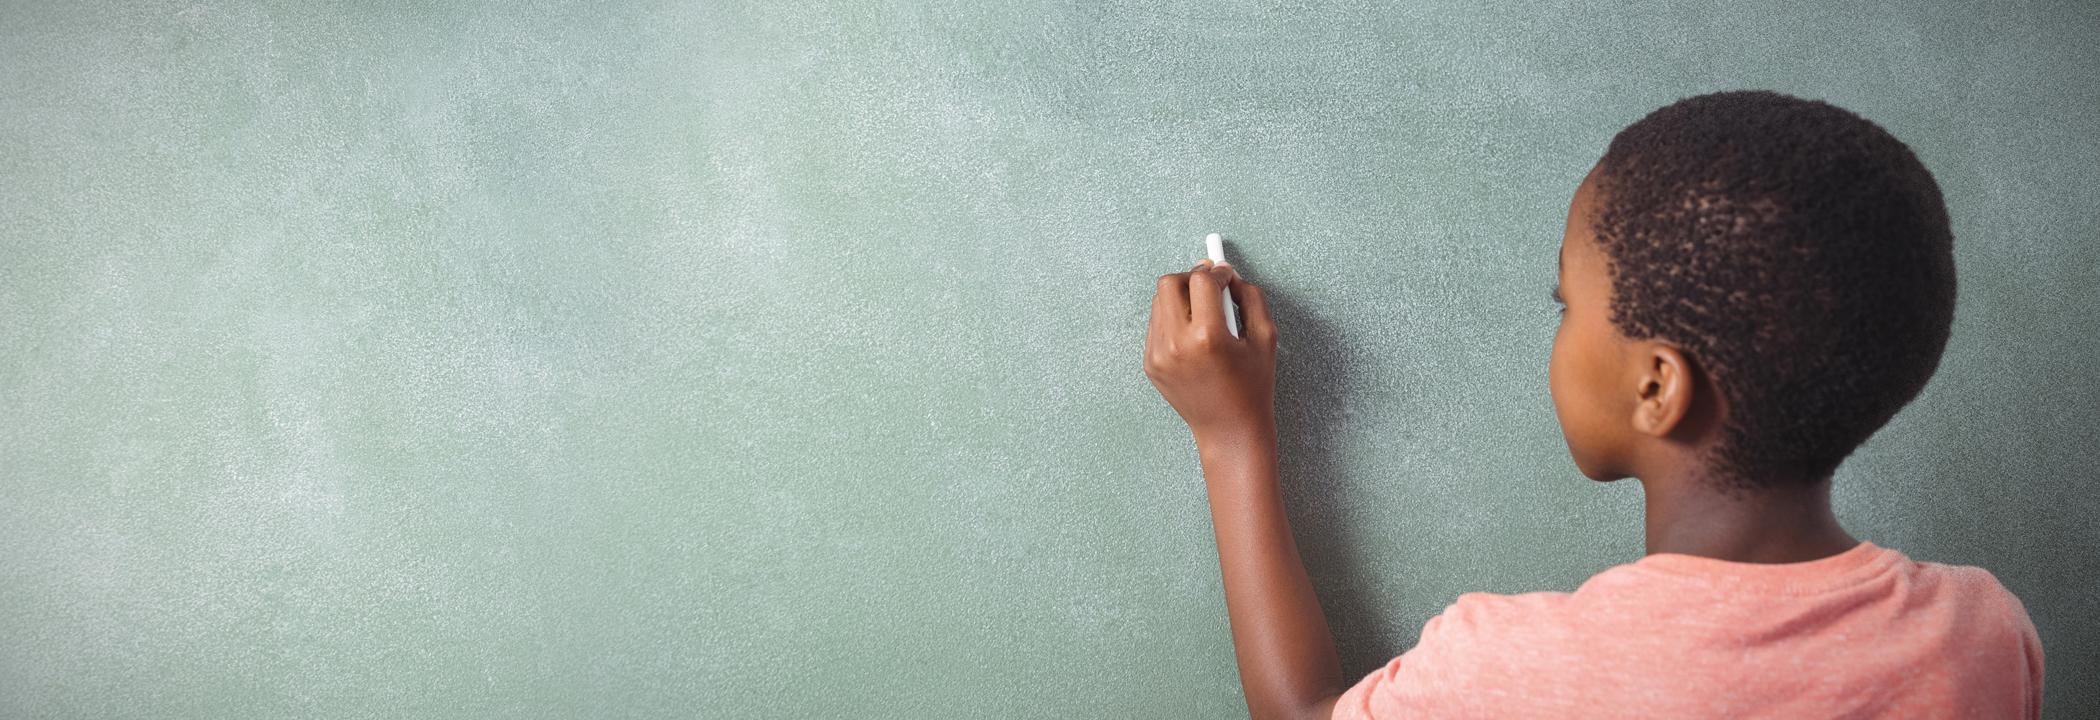 https://www.optometrists.org/findeyedoctordirectory/templateresources/carousel/boy-school-blackboard-diverse-on_rt_DR125279003_CROP.jpg